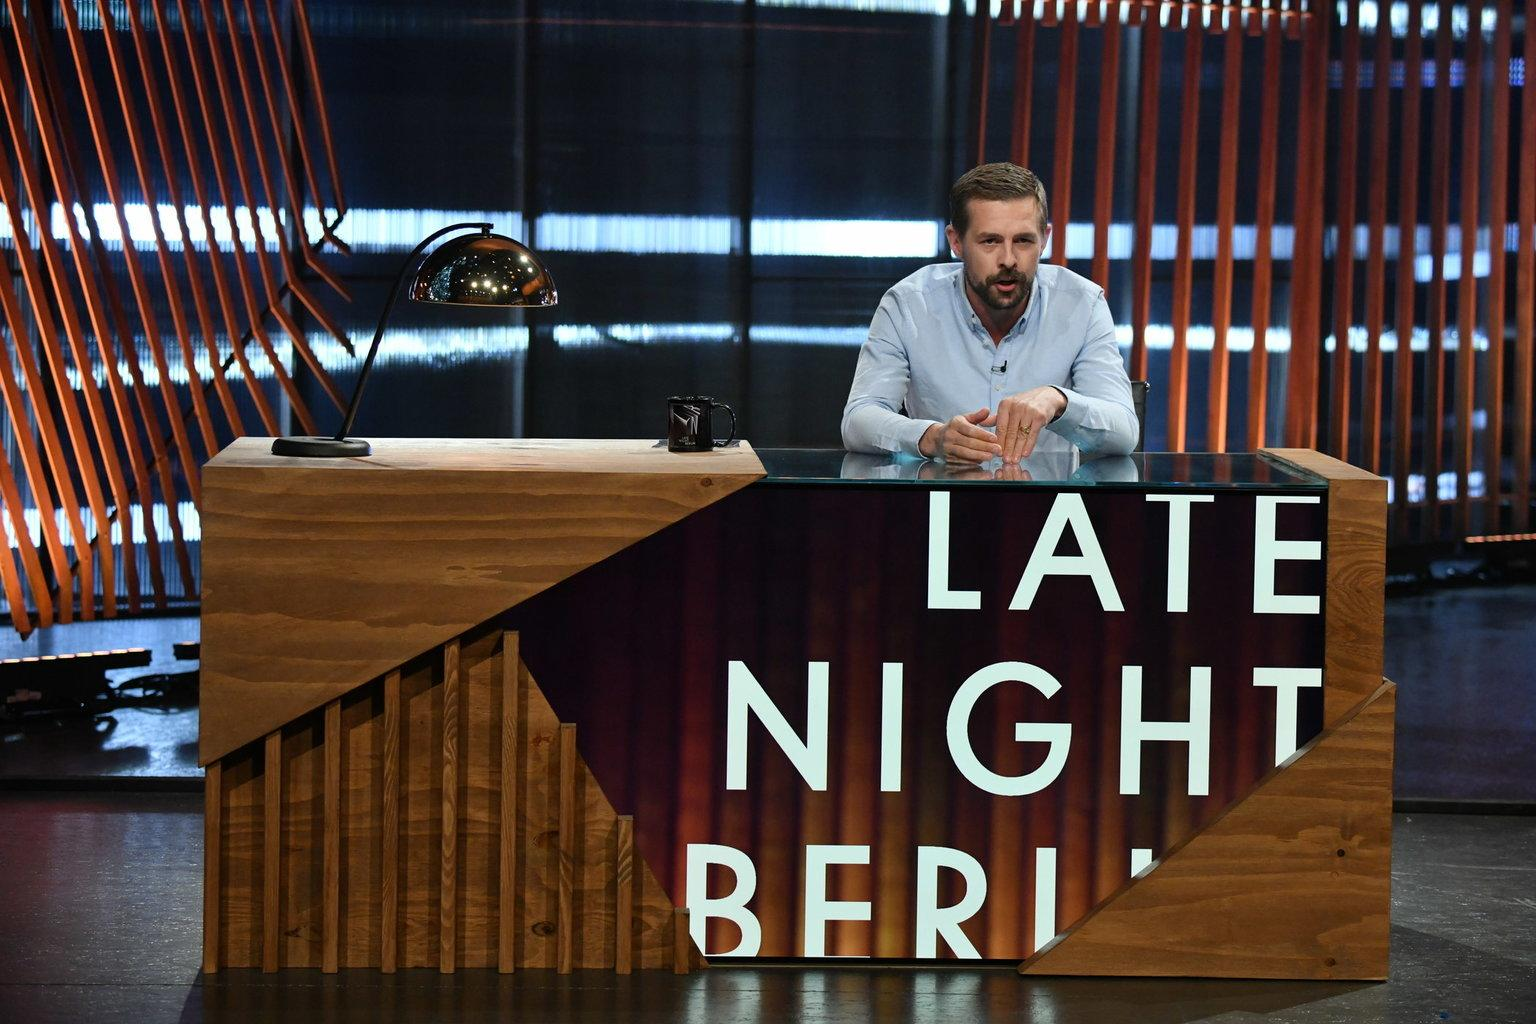 latenight berlin